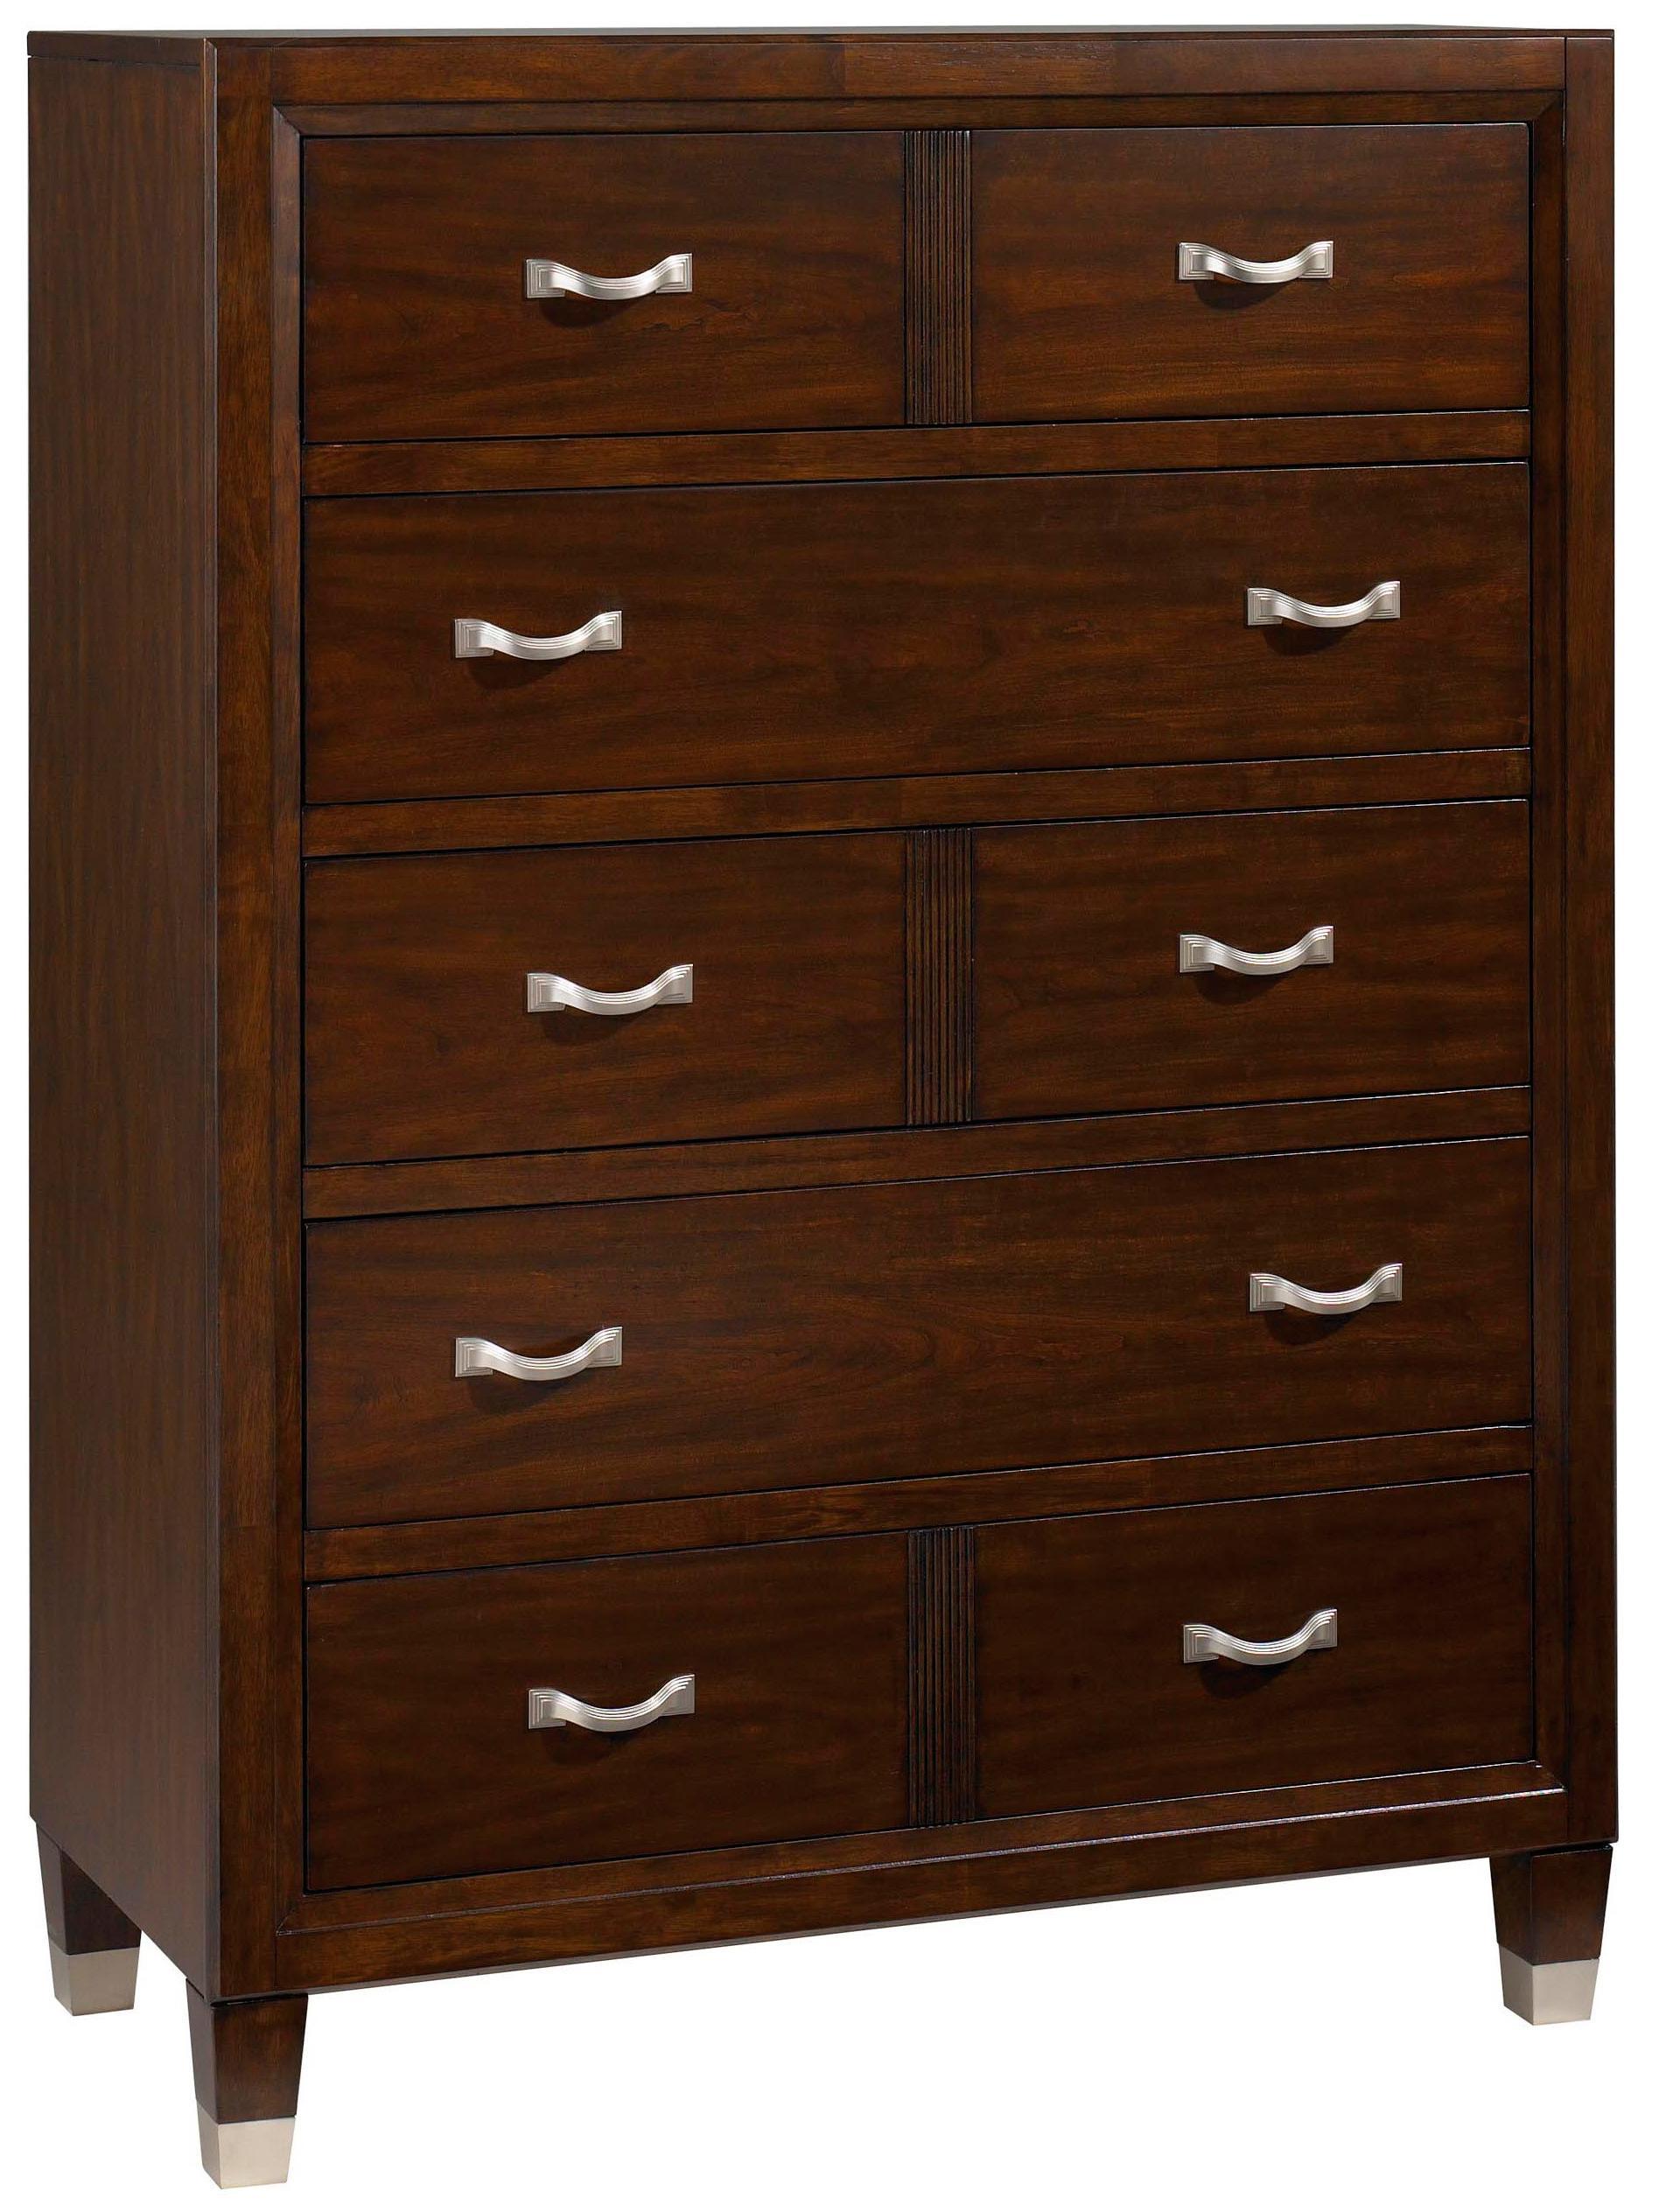 Broyhill Furniture Eastlake 2 Drawer Chest - Item Number: 4264-240